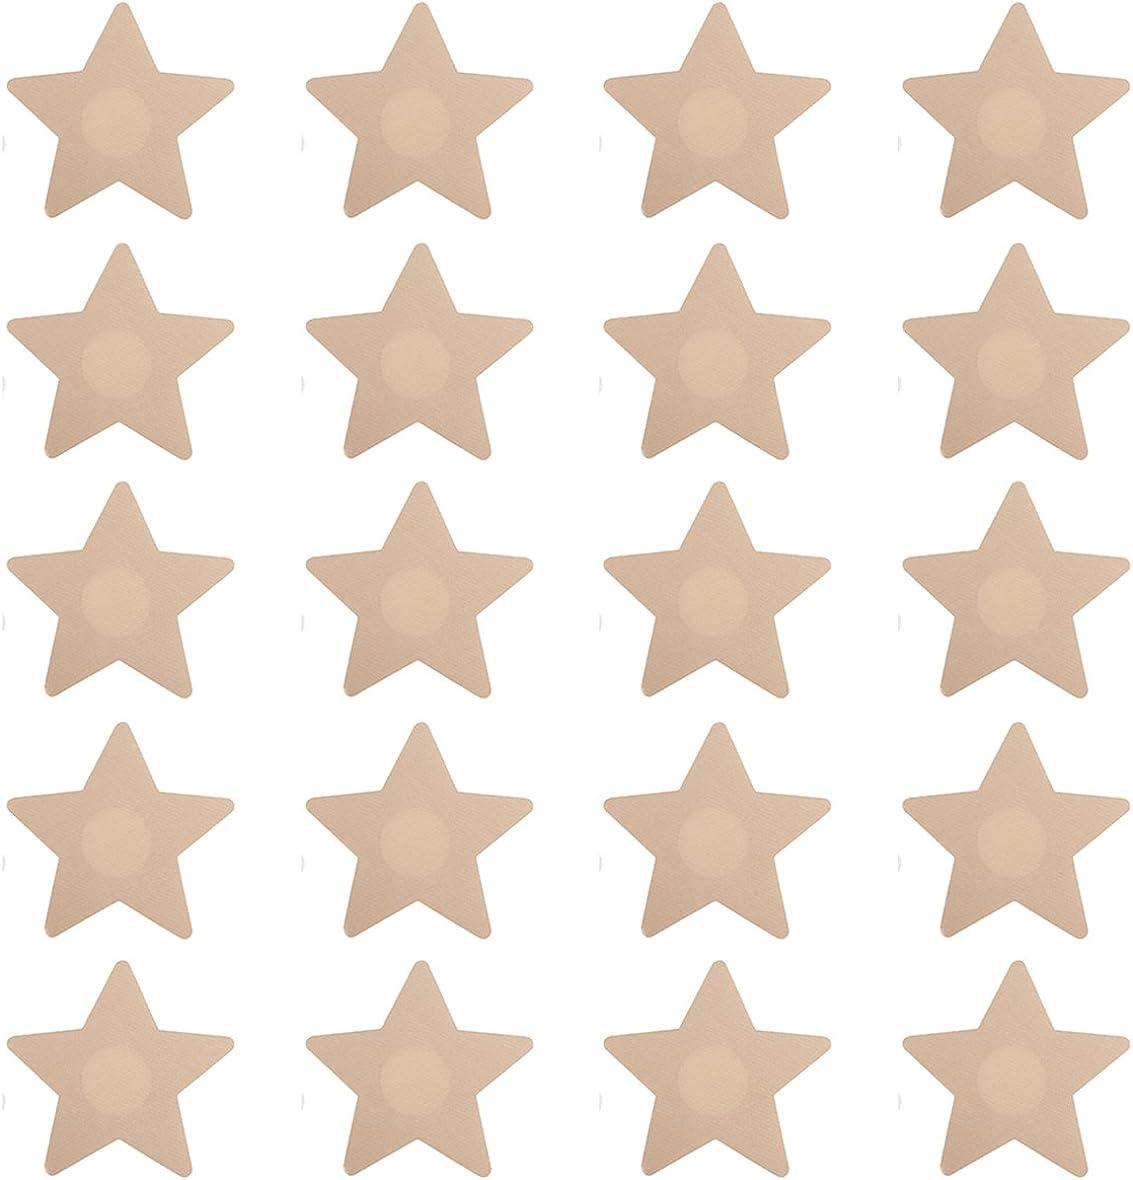 10 New Free Shipping Pairs Star Shape Max 66% OFF NippleCovers Breast Pe Adhesive Pasties Bra